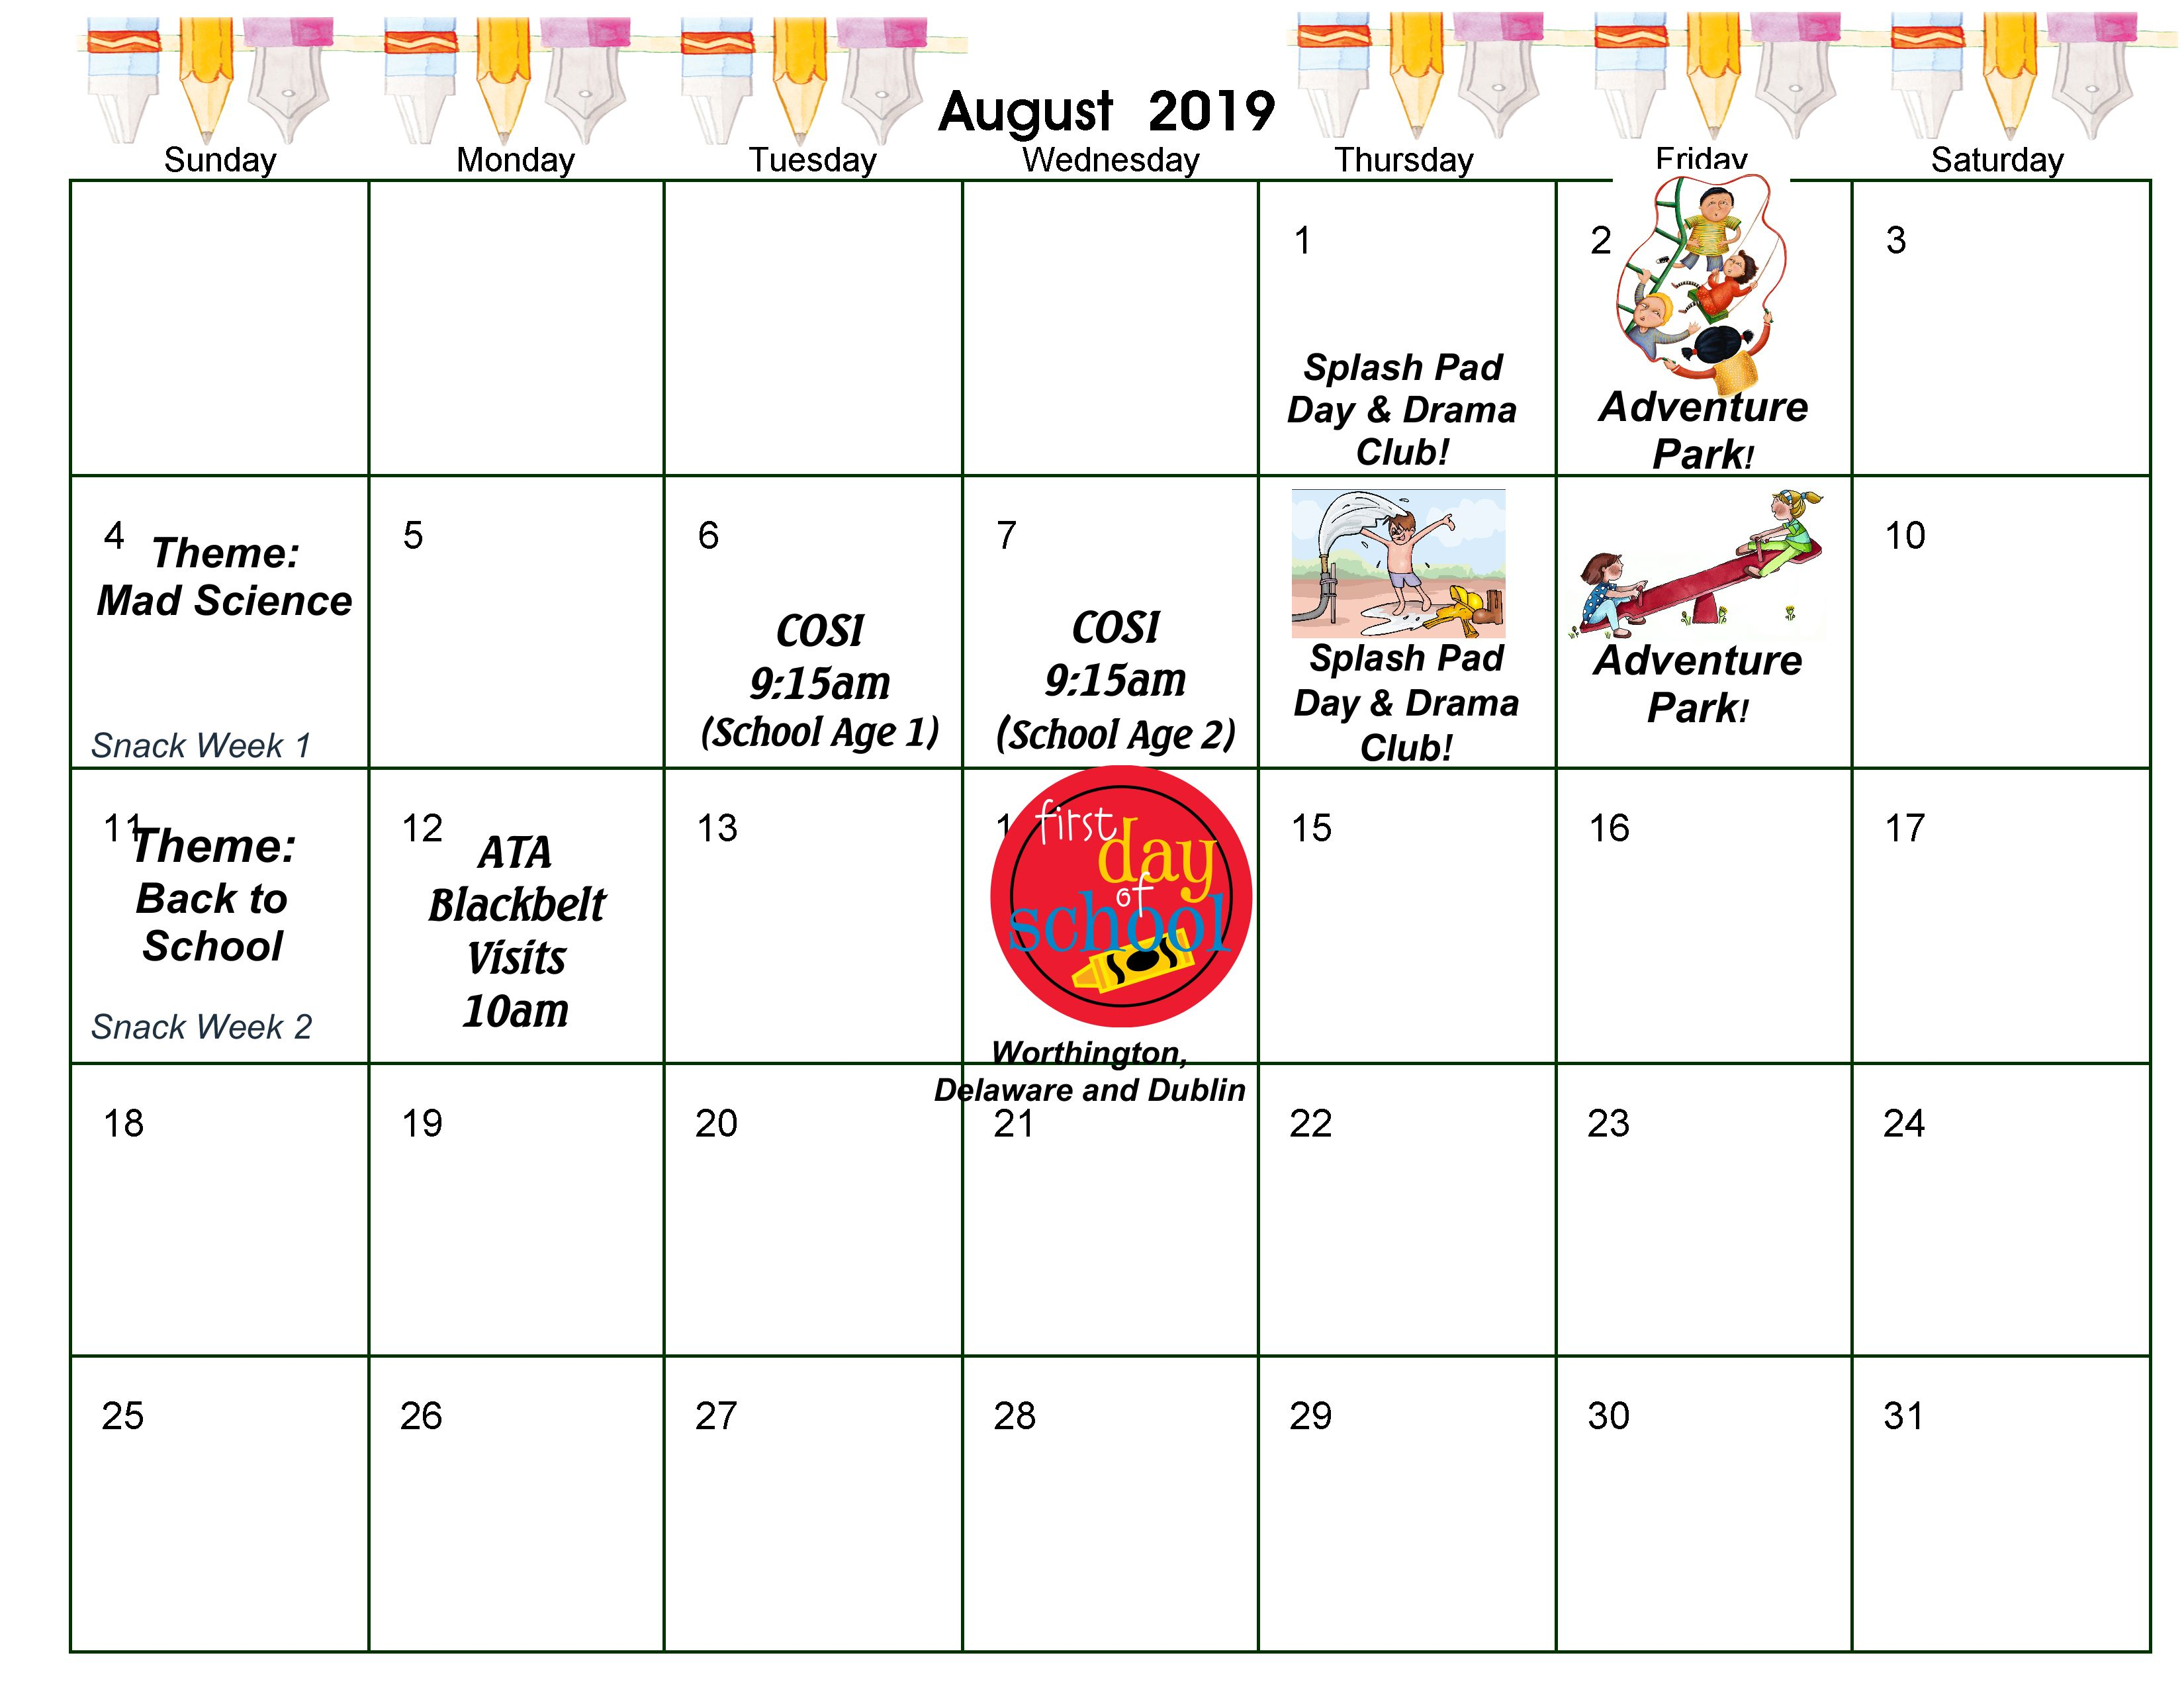 2019-8 SA August Calendar-001.jpg